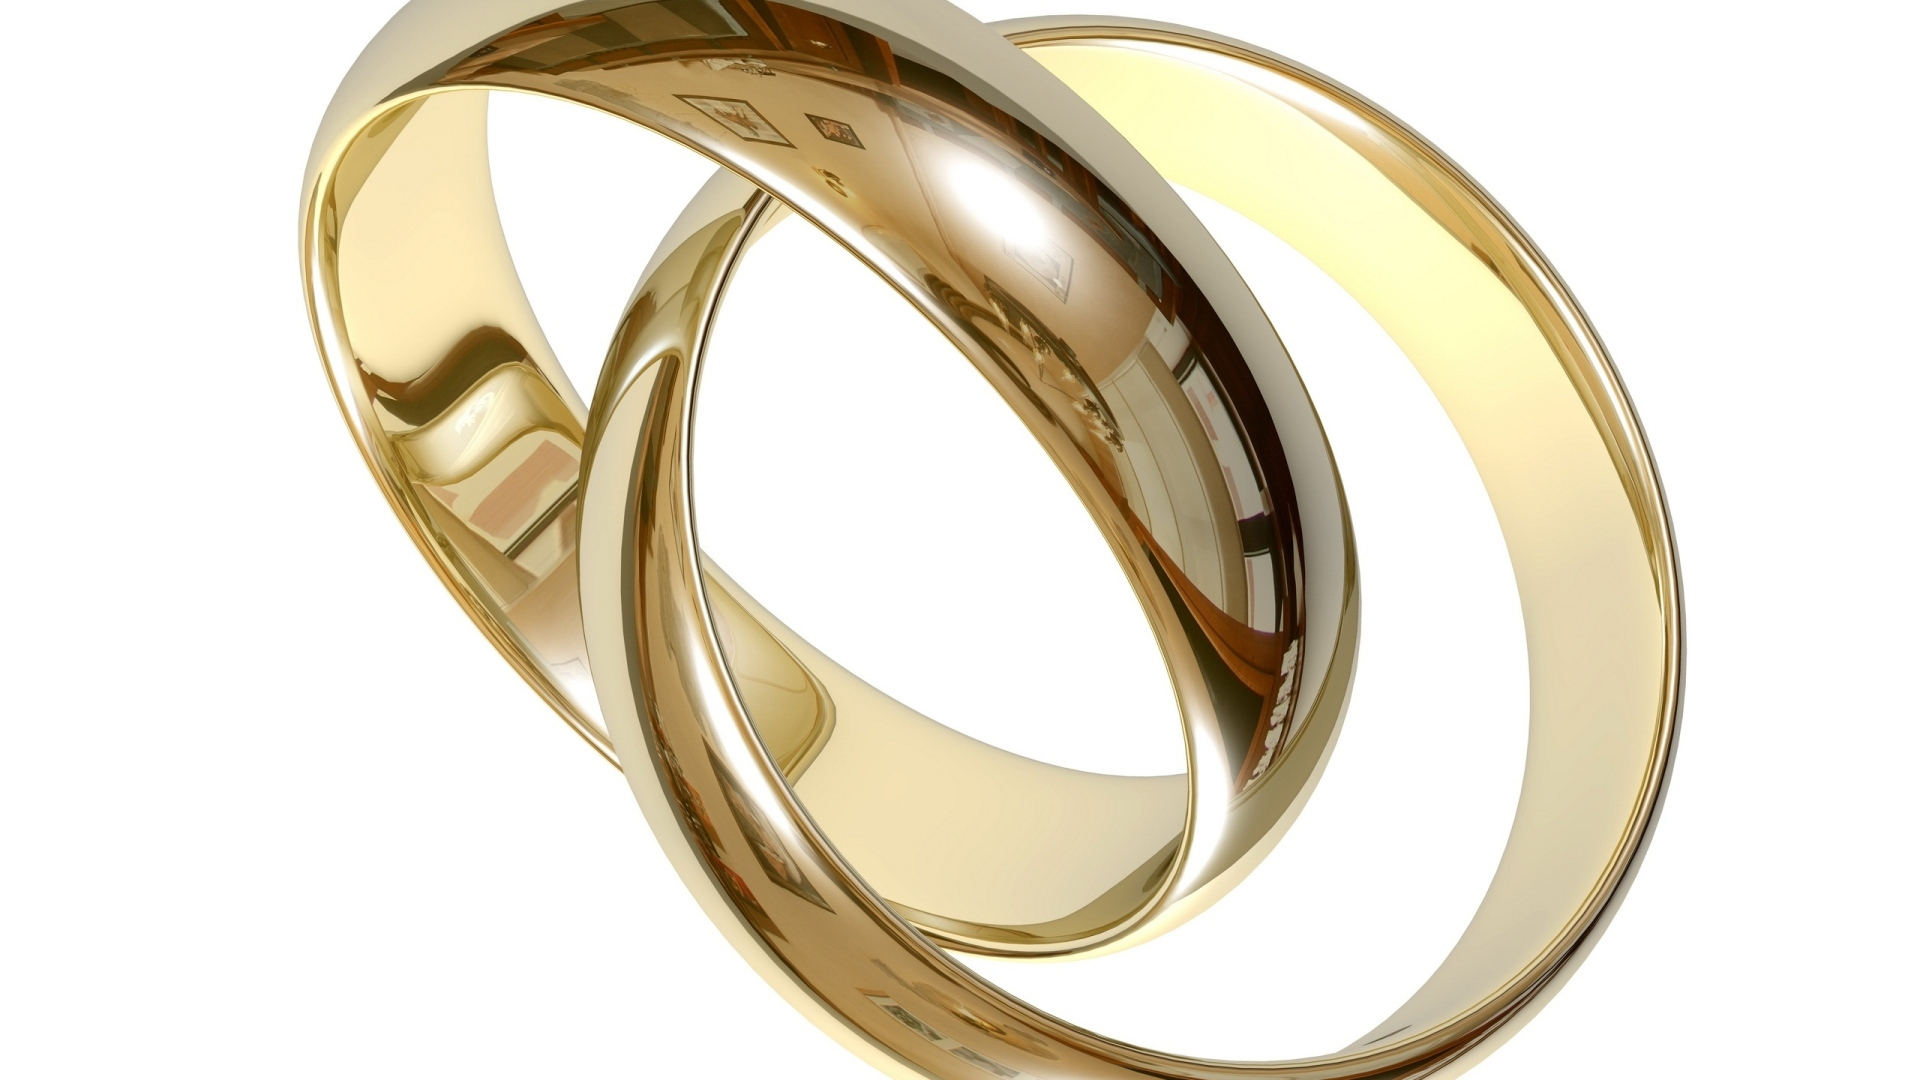 Download Wallpaper 1920x1080 Wedding, Rings, Gold Full Hd. Staghead Wedding Rings. Irish Mens Wedding Wedding Rings. 2ct Engagement Rings. Wood Inlay Engagement Rings. Monogram Wedding Rings. Milwaukee Buck Rings. Big Fat Rings. Husband Wedding Wedding Rings